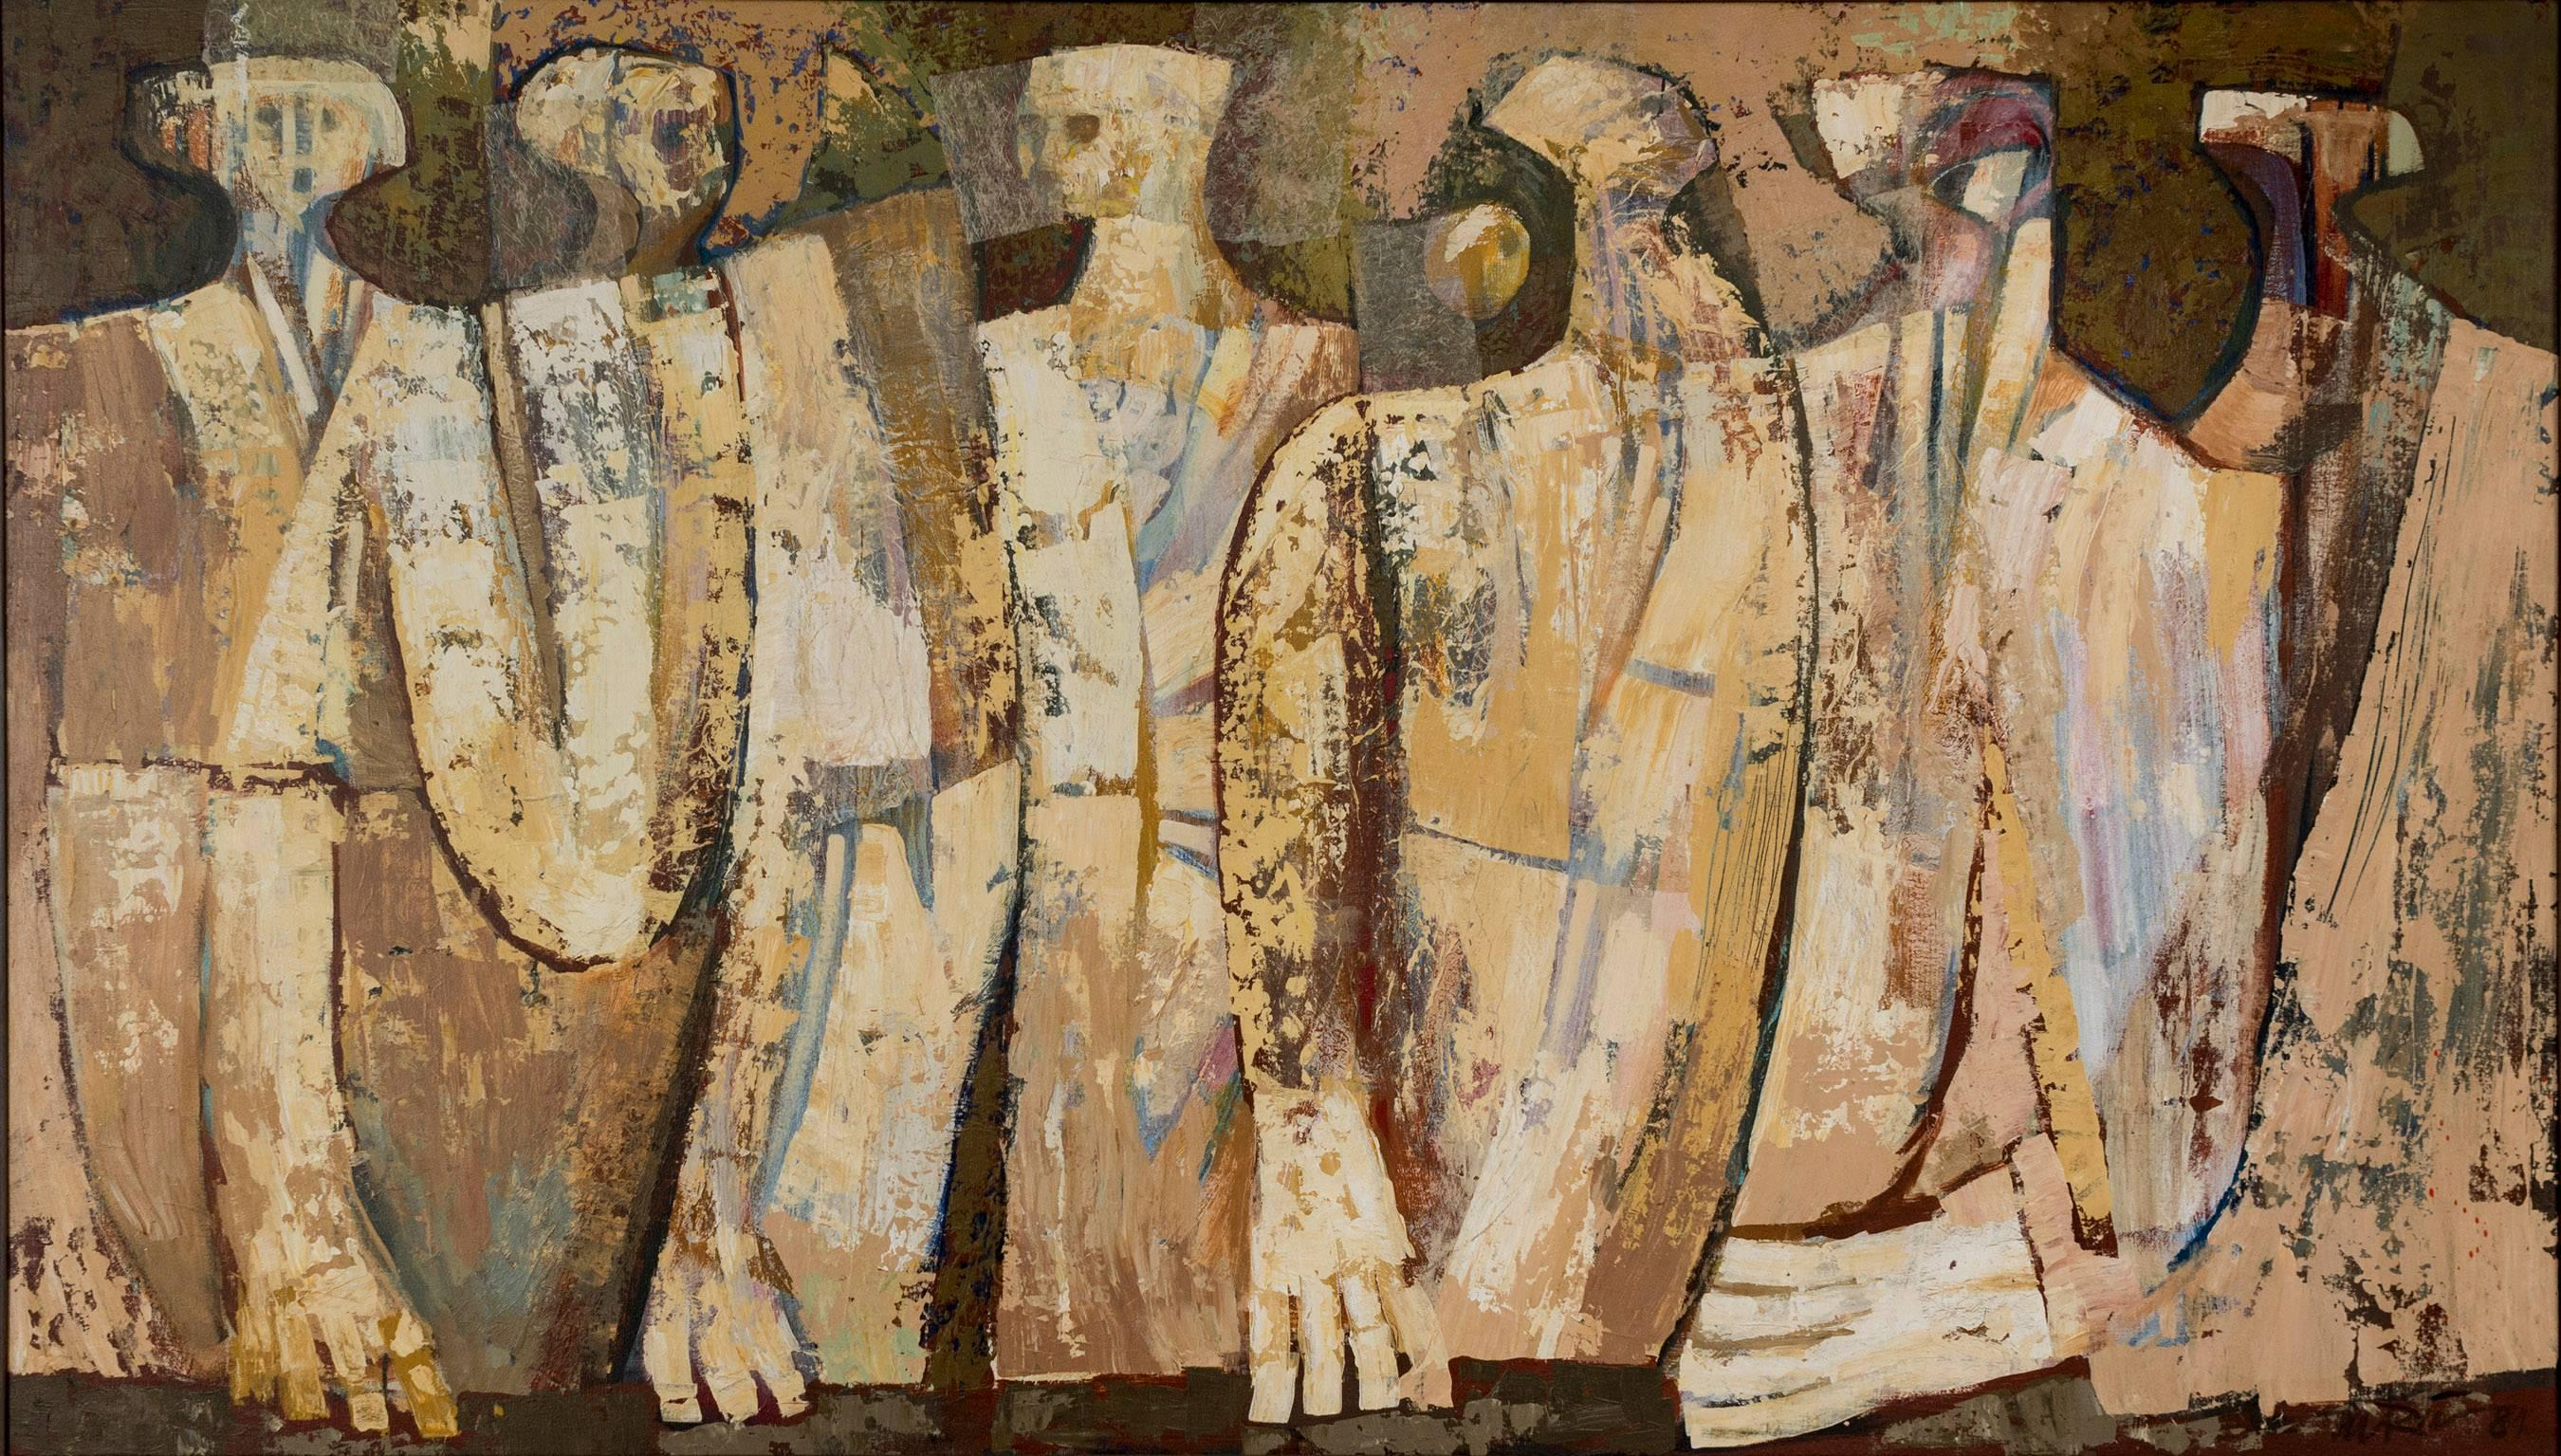 895acd62bd0 Augusto Marin - El jurado - Puerto Rican Art